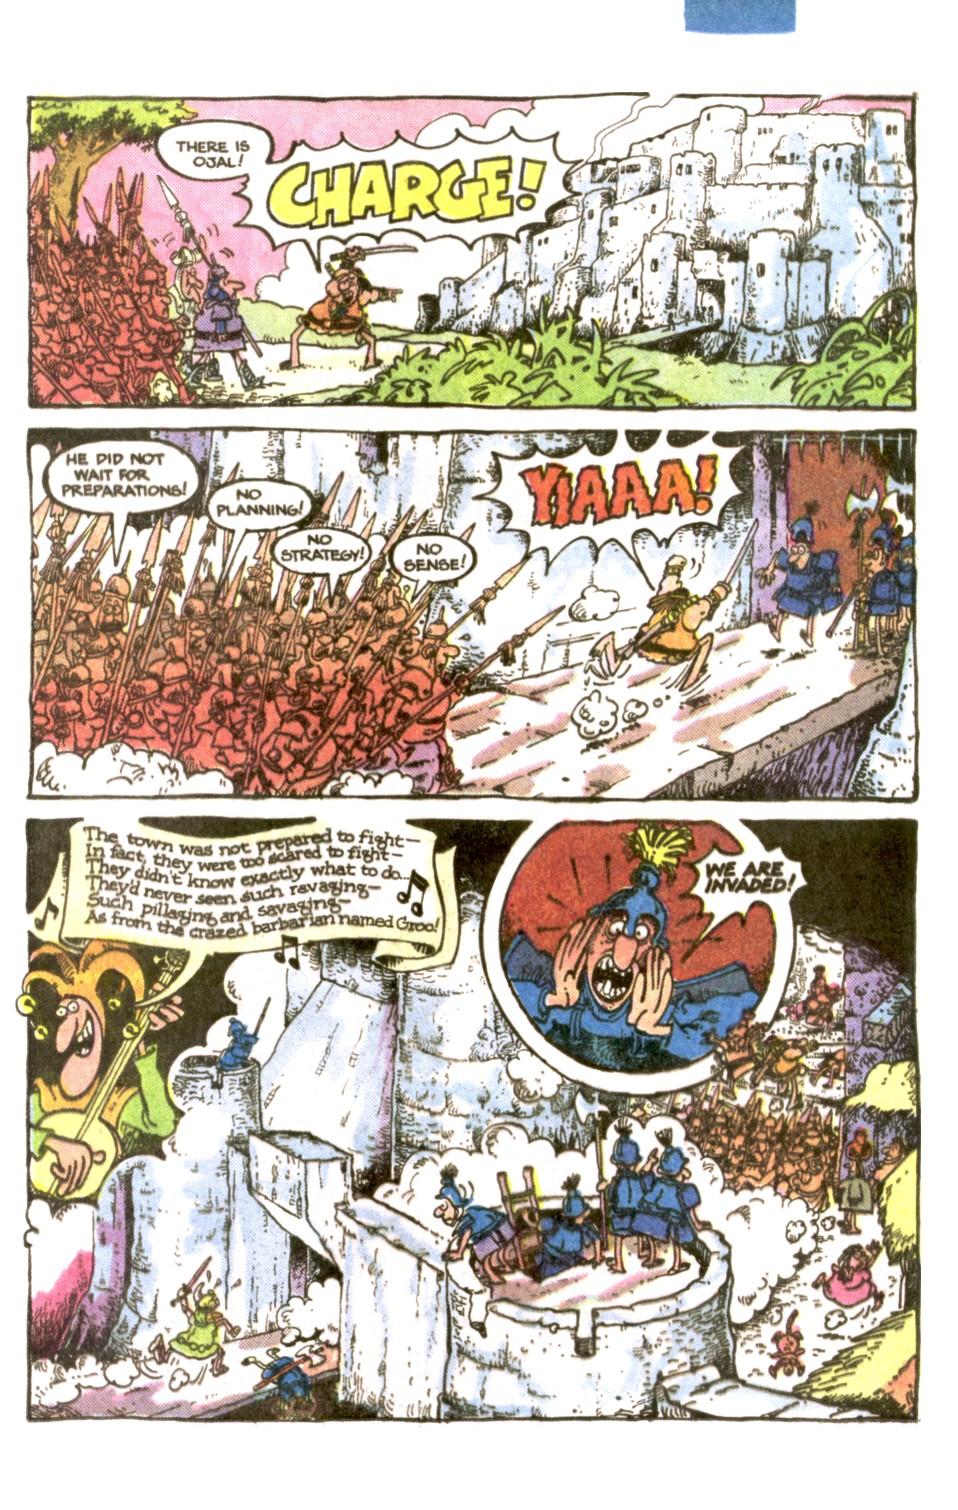 Read online Sergio Aragonés Groo the Wanderer comic -  Issue #1 - 15